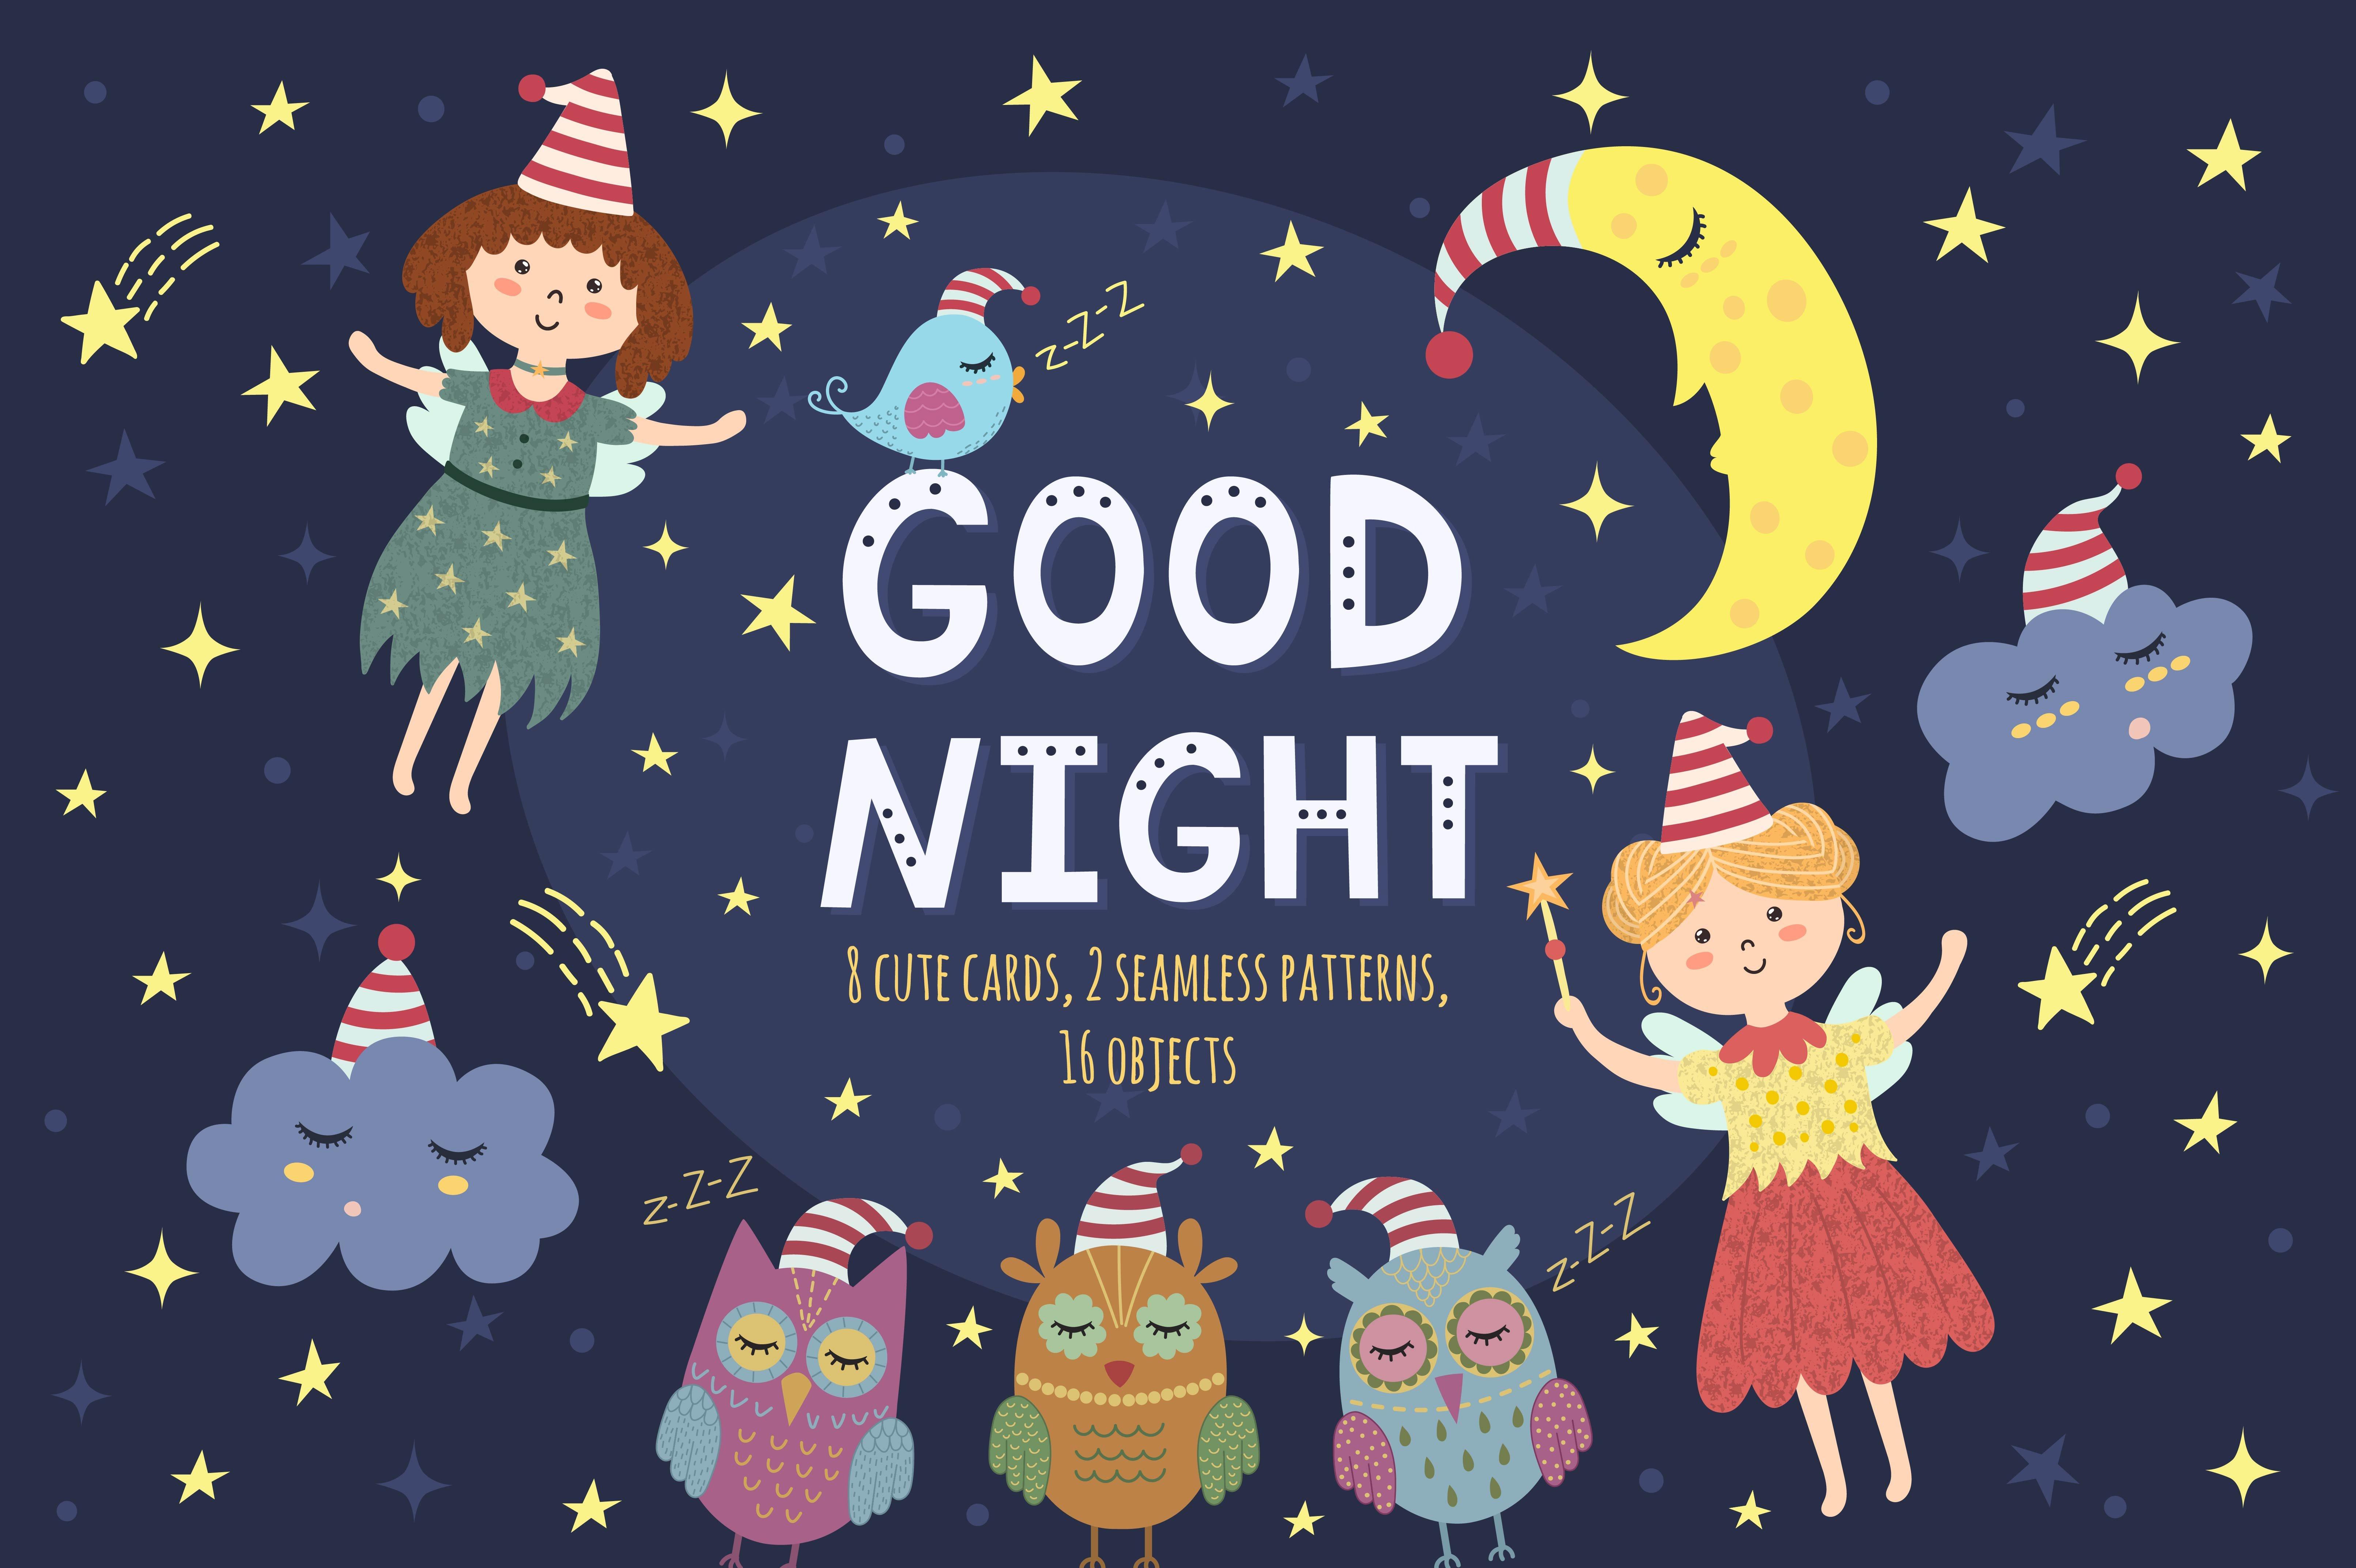 Good Night Vol 1 Patterns Cards Illustrations Creative Market